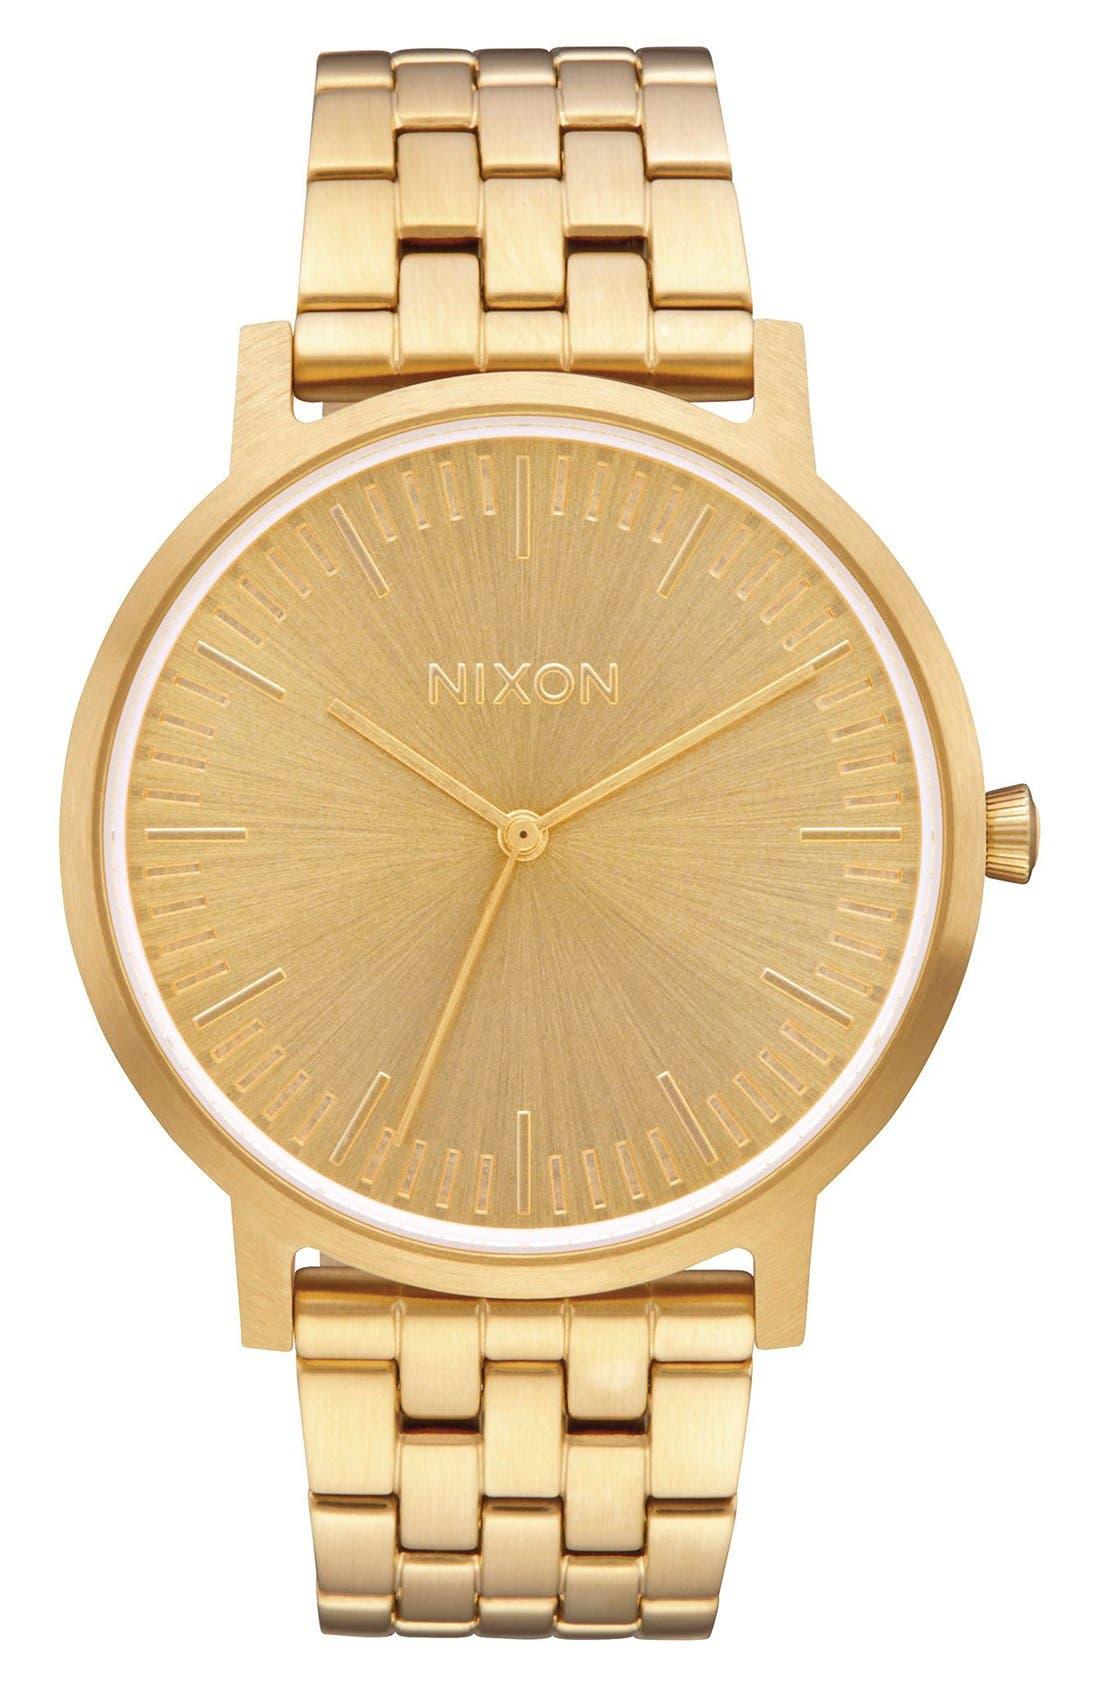 Main Image - Nixon The Porter Bracelet Watch, 40mm